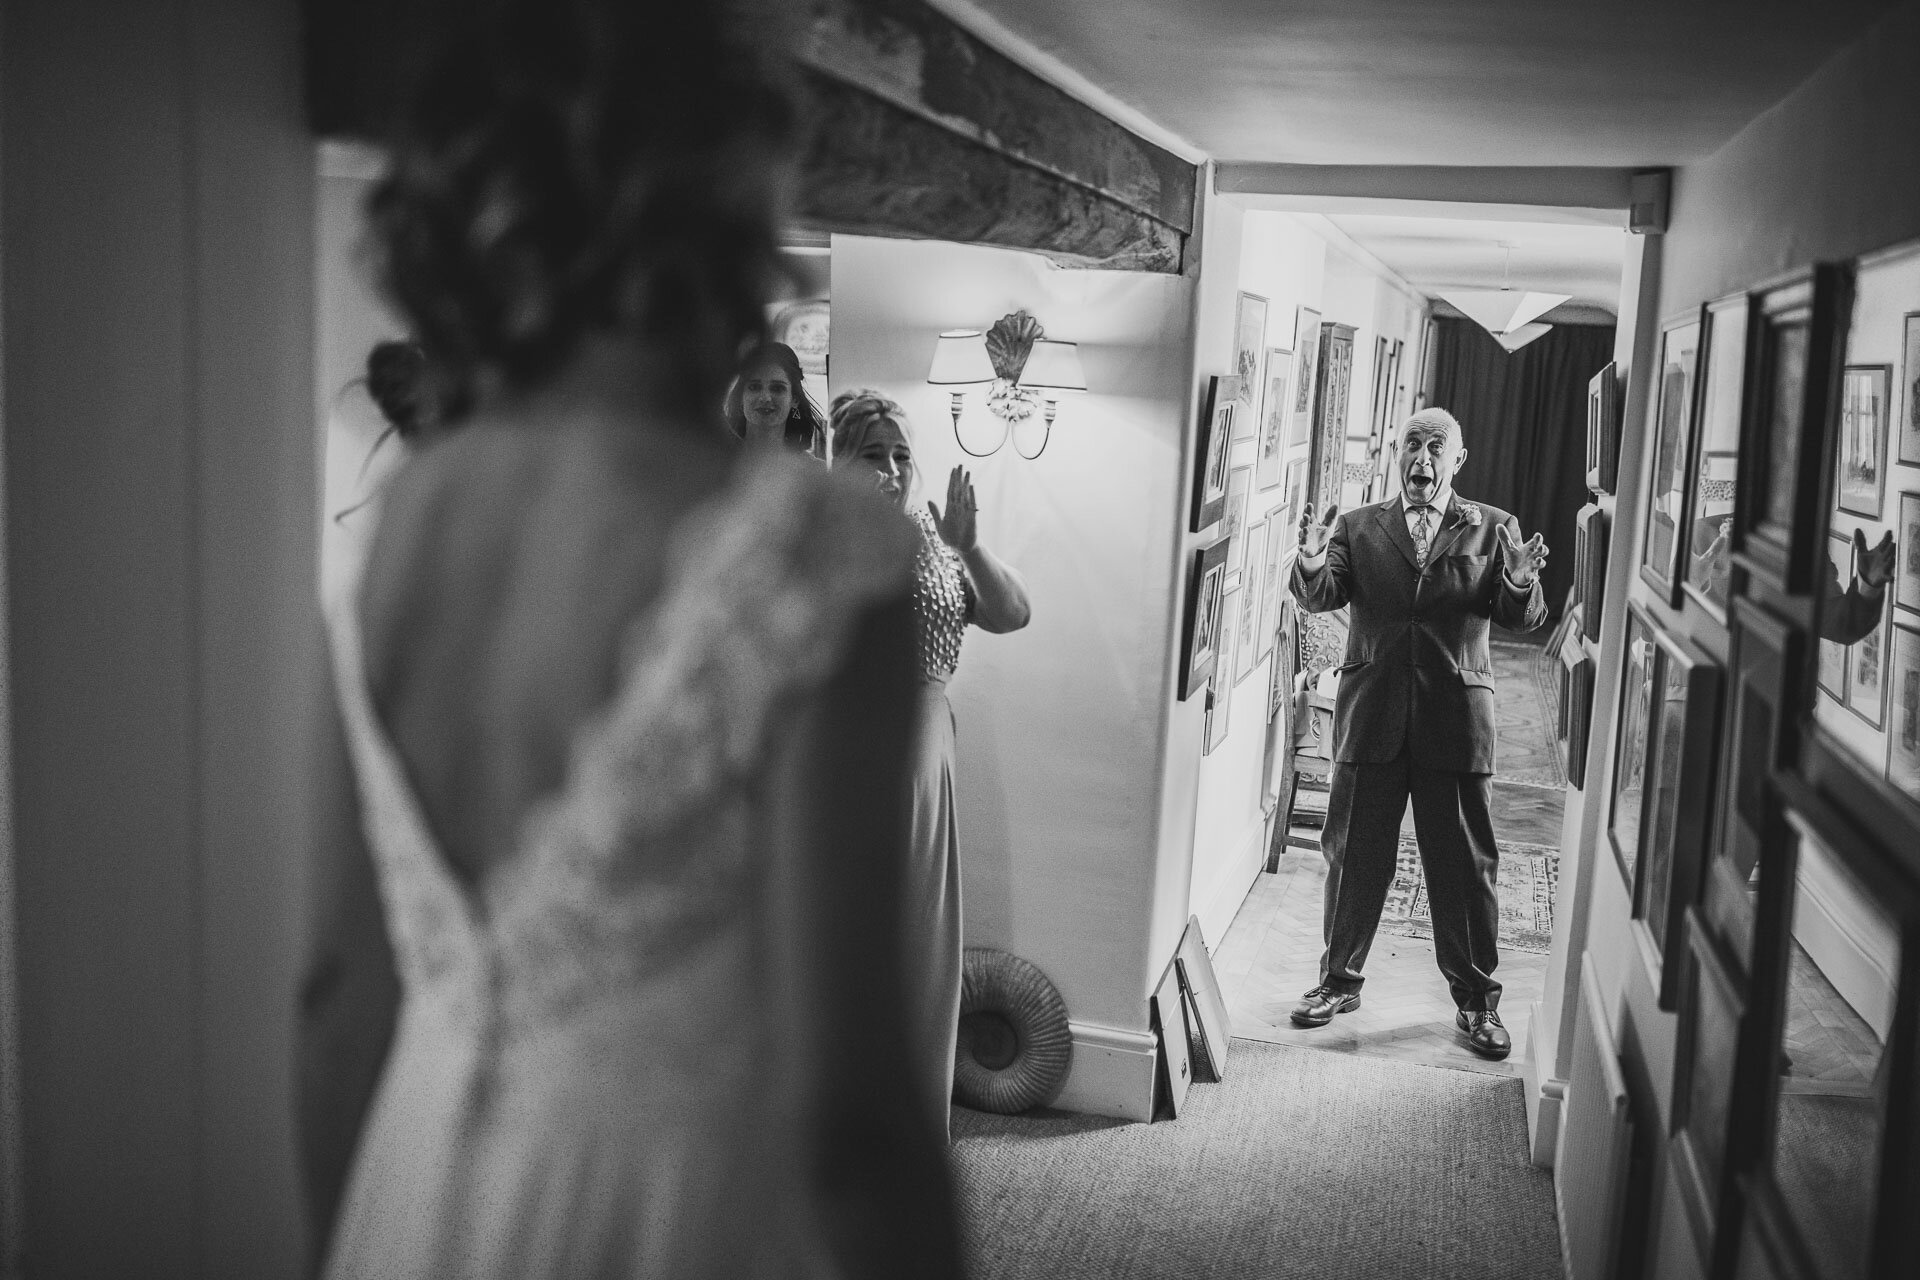 dorset_wedding_photographer-21.jpg